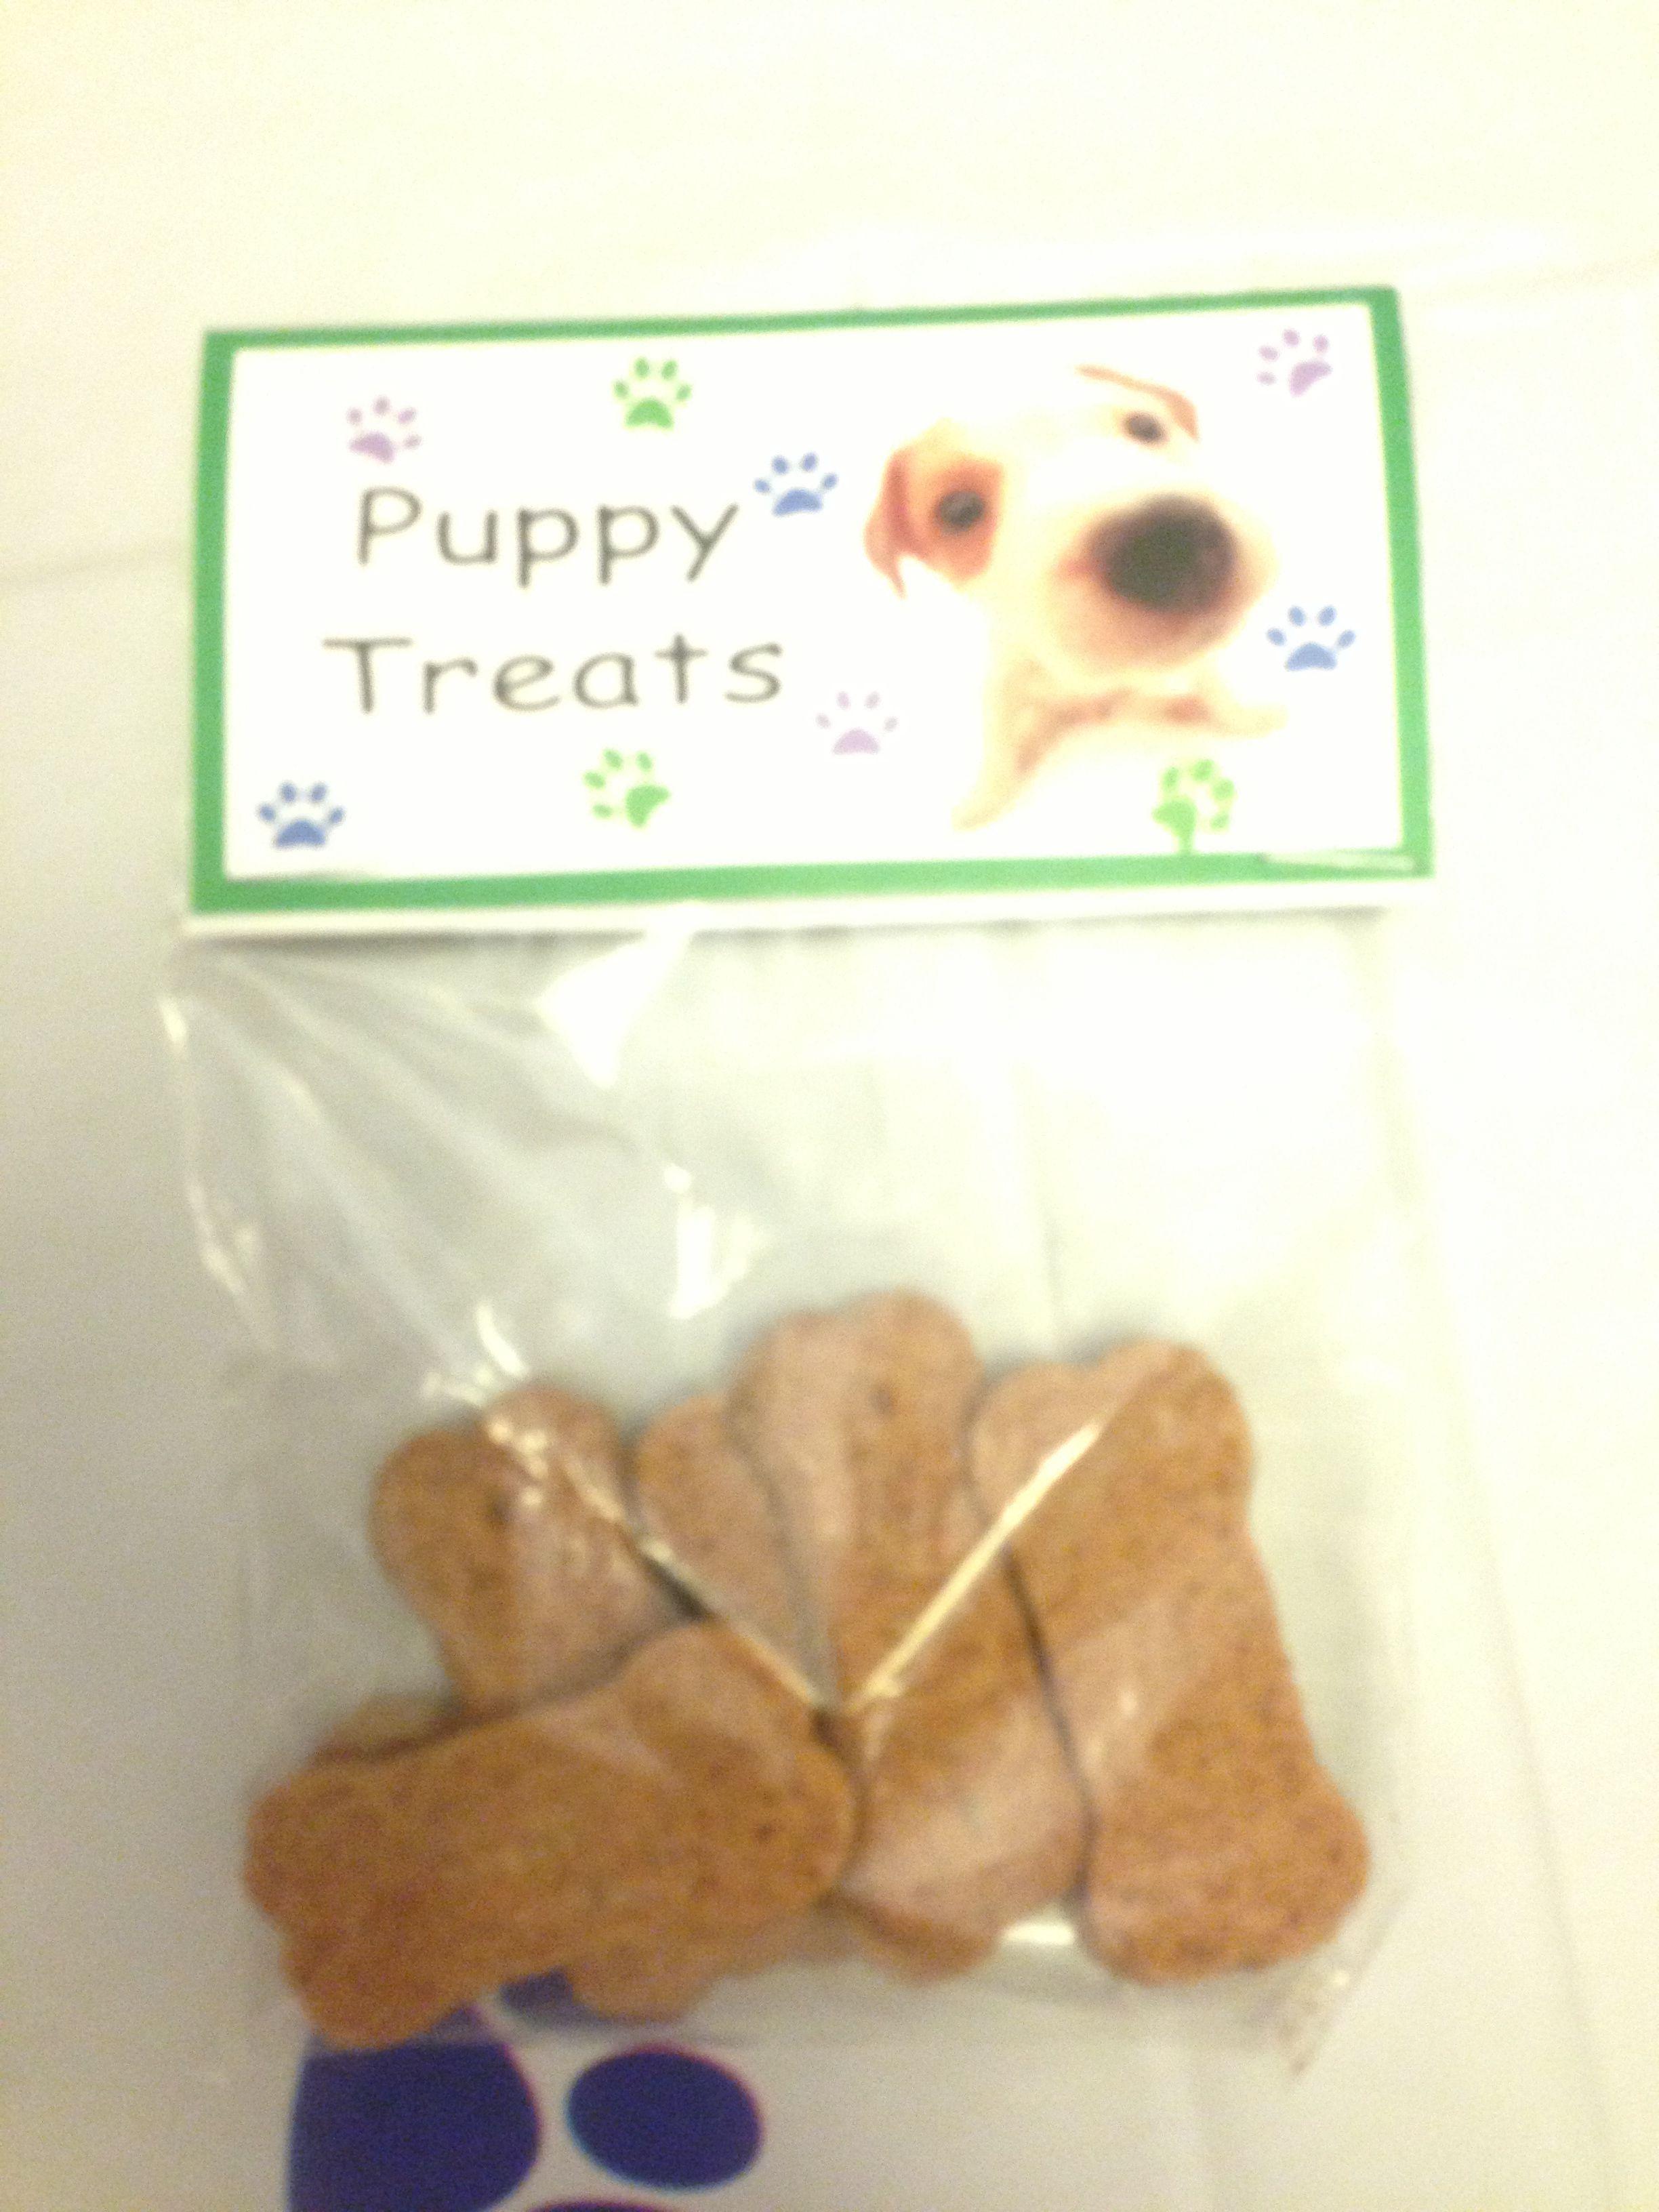 Are those  really Puppy Treats?